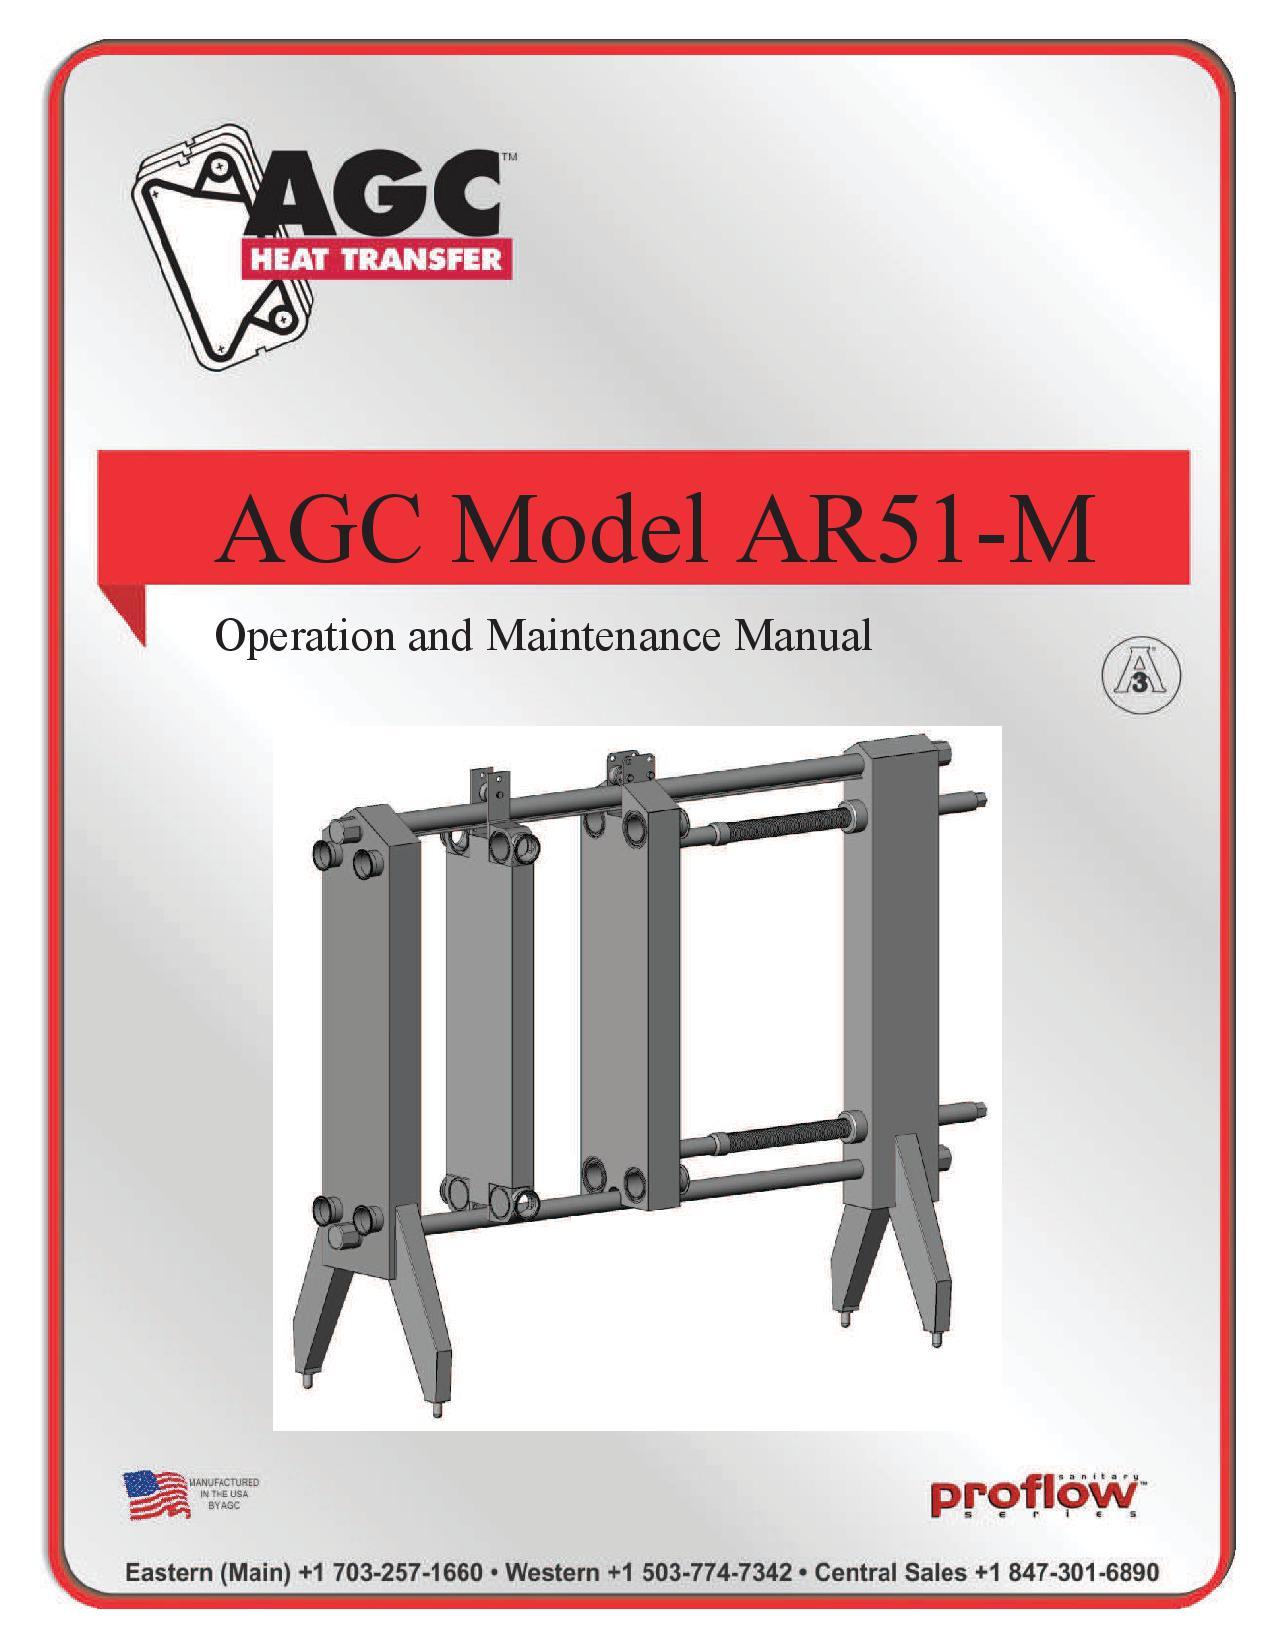 AR51-M OPERATION MANUAL